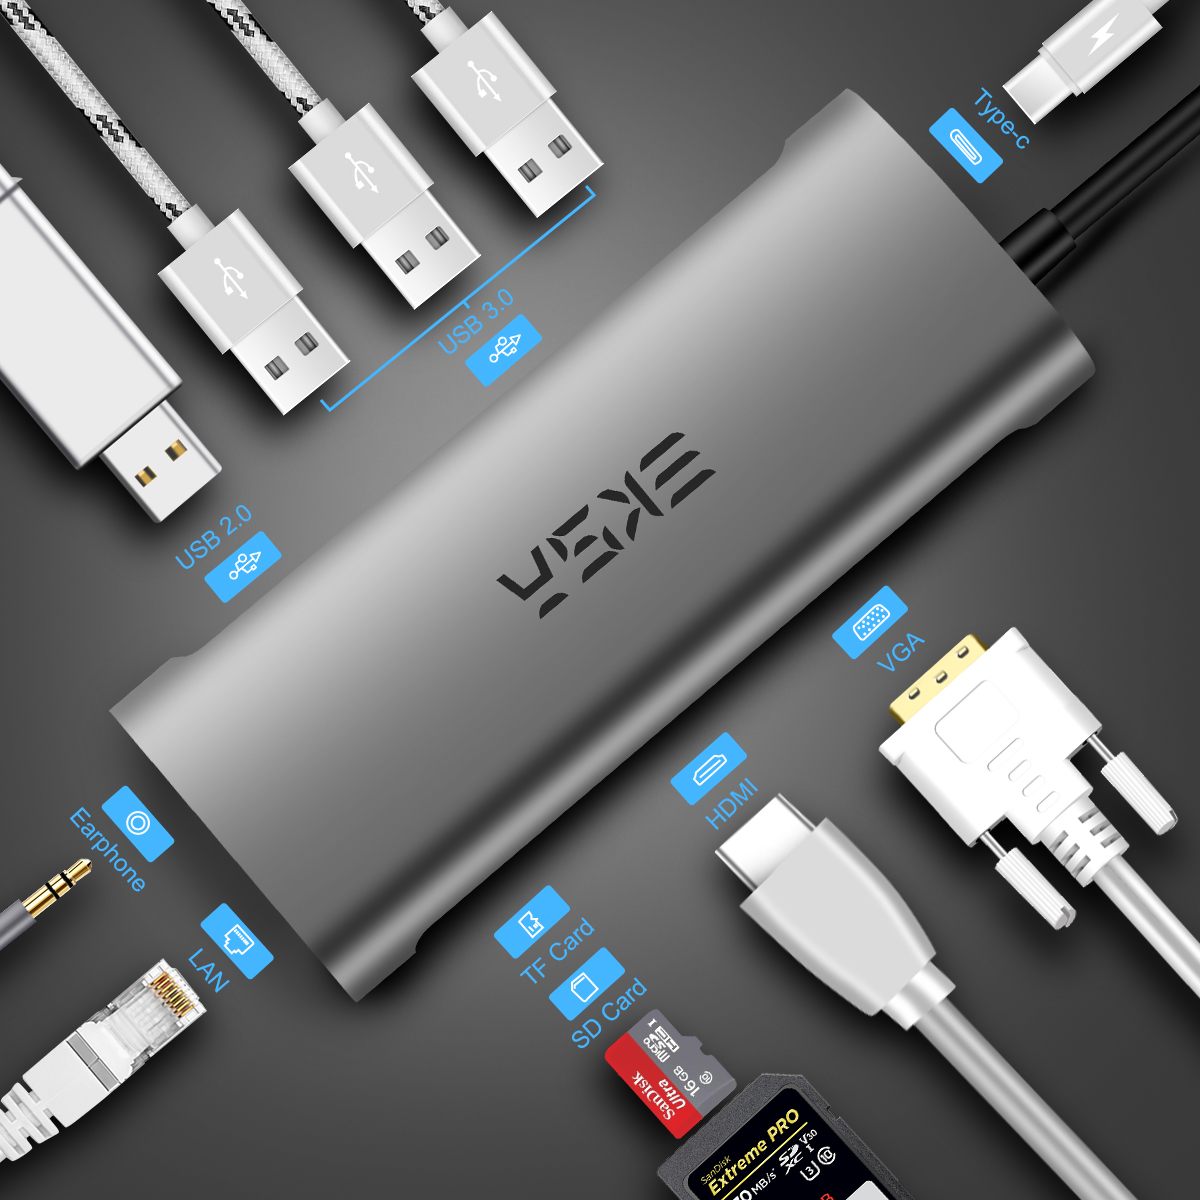 Moyeu USB EKSA moyeu C vers USB 3.0 2.0 adaptateur RJ45 VGA HDMI Dock pour MacBook Pro Huawei Samsung USB-C Type C 3.0 moyeu de USB C séparateur